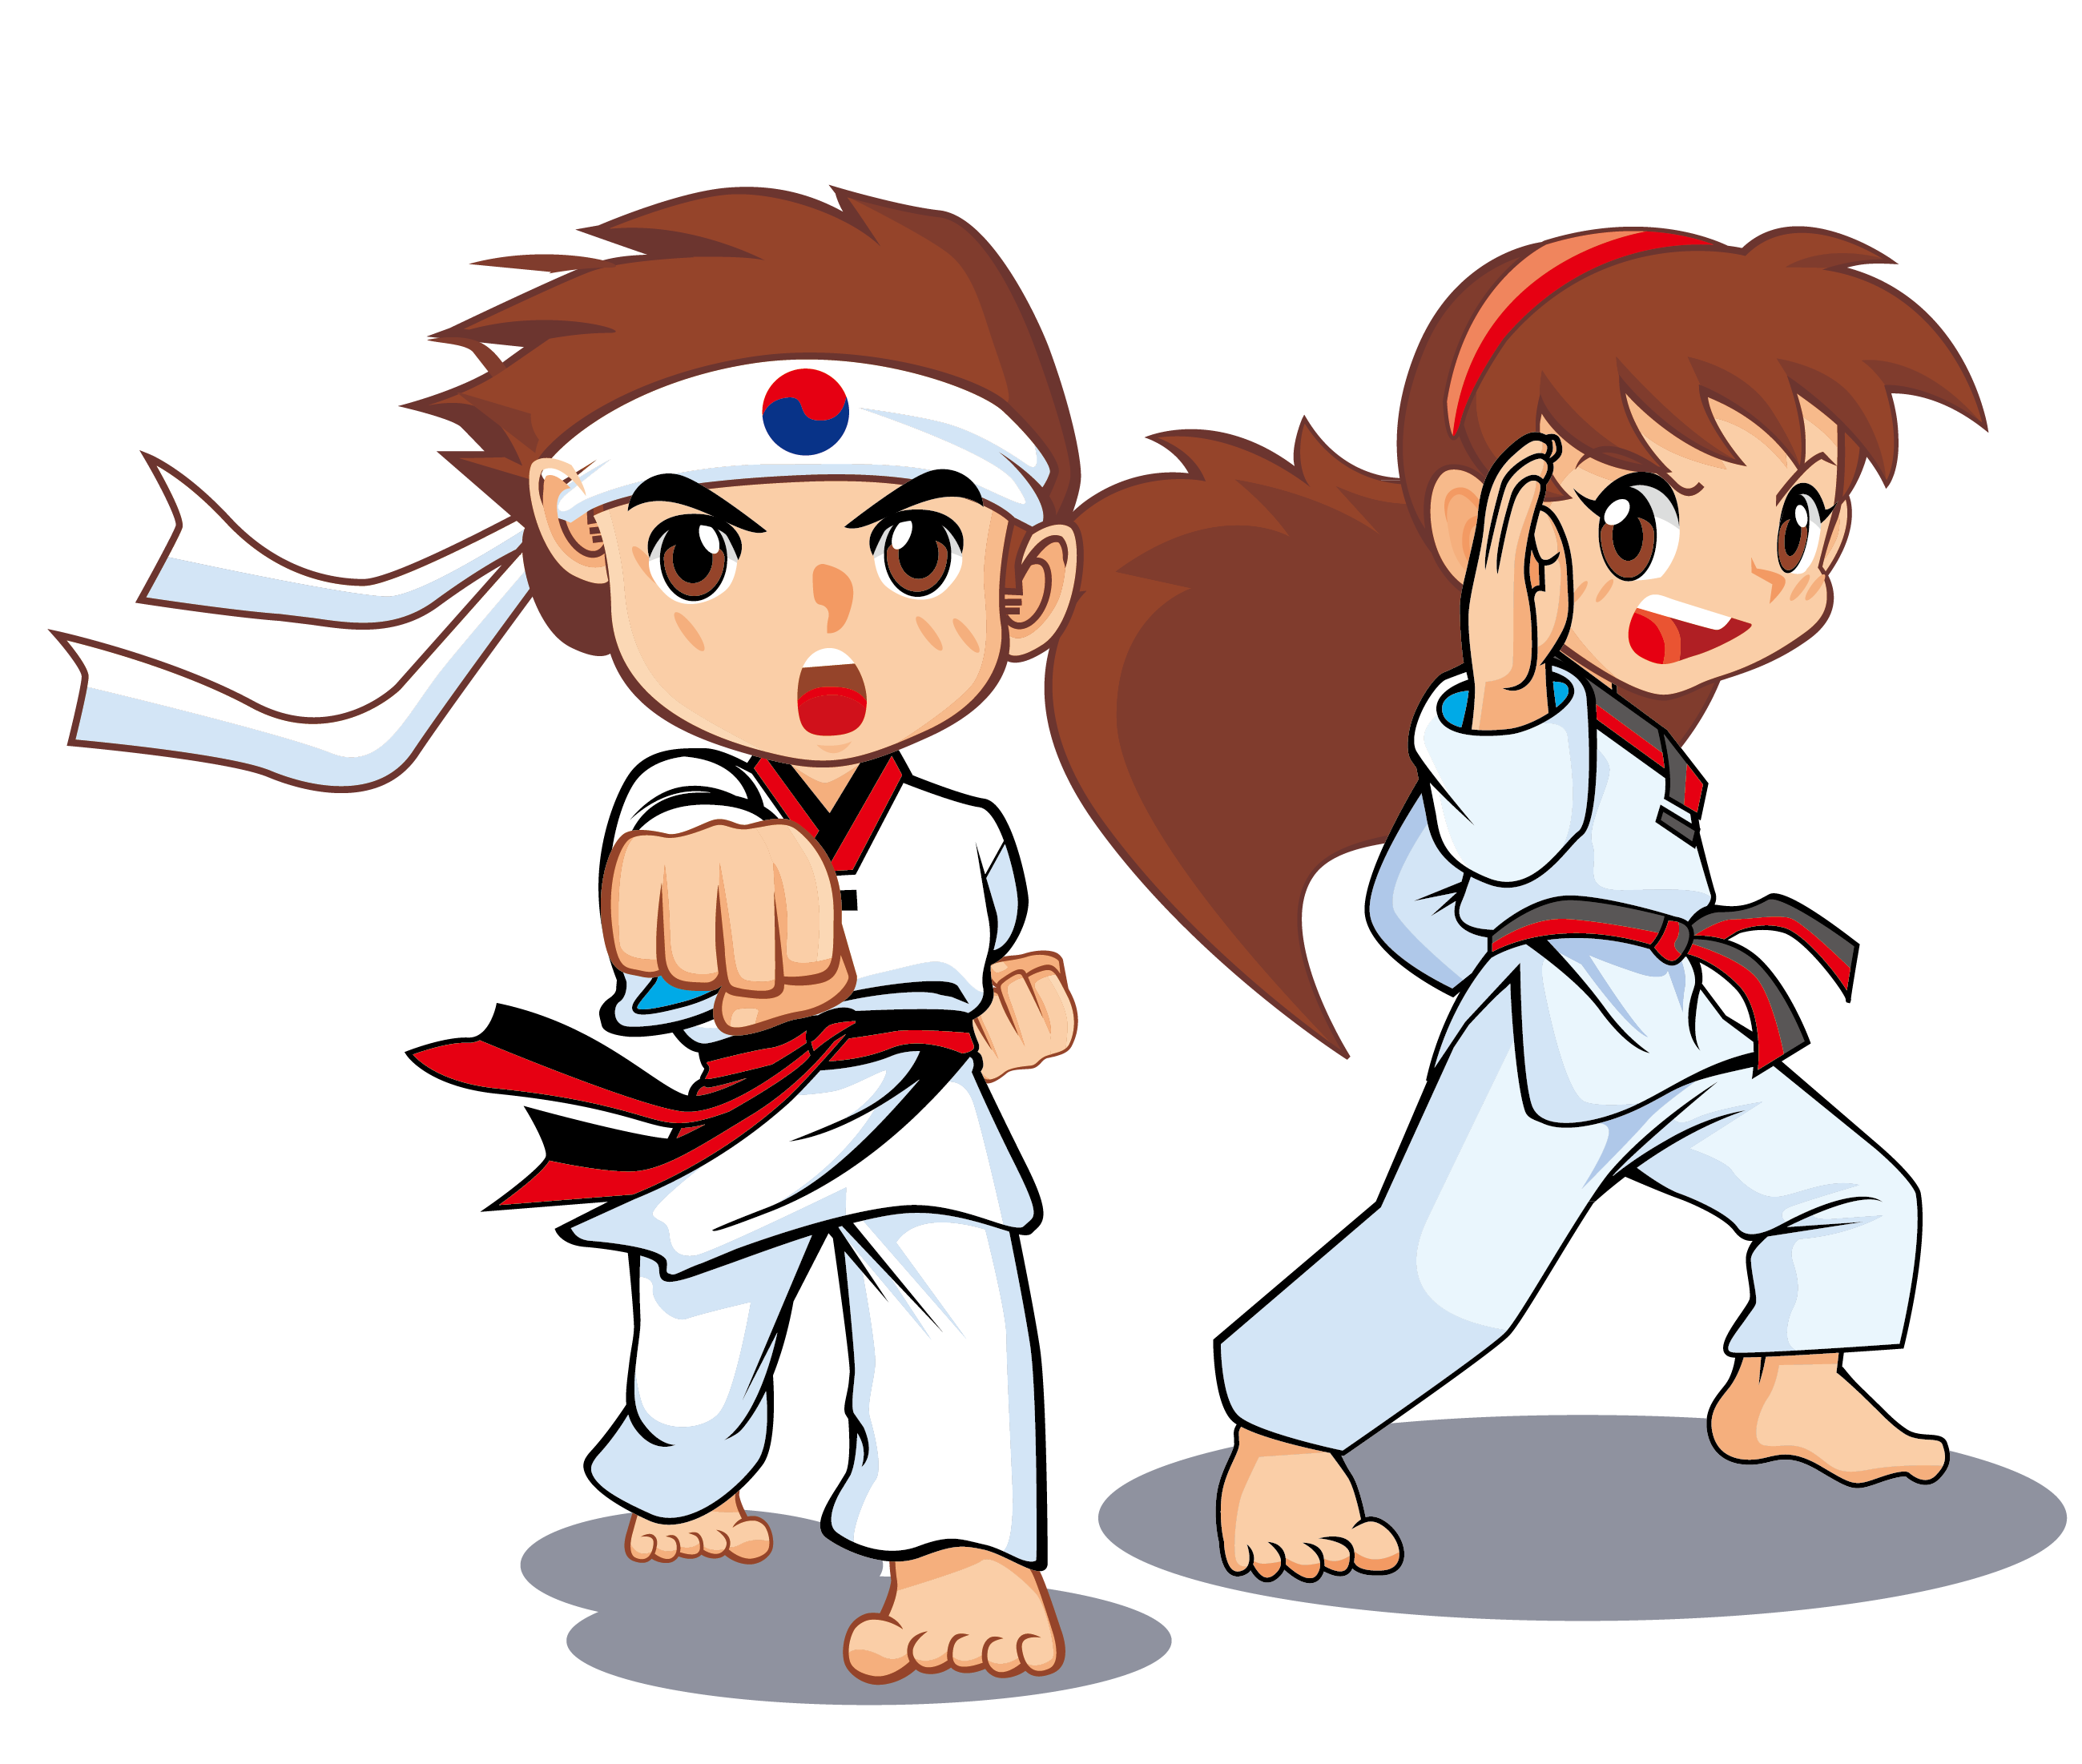 Fist clipart taekwondo. Martial arts icon game